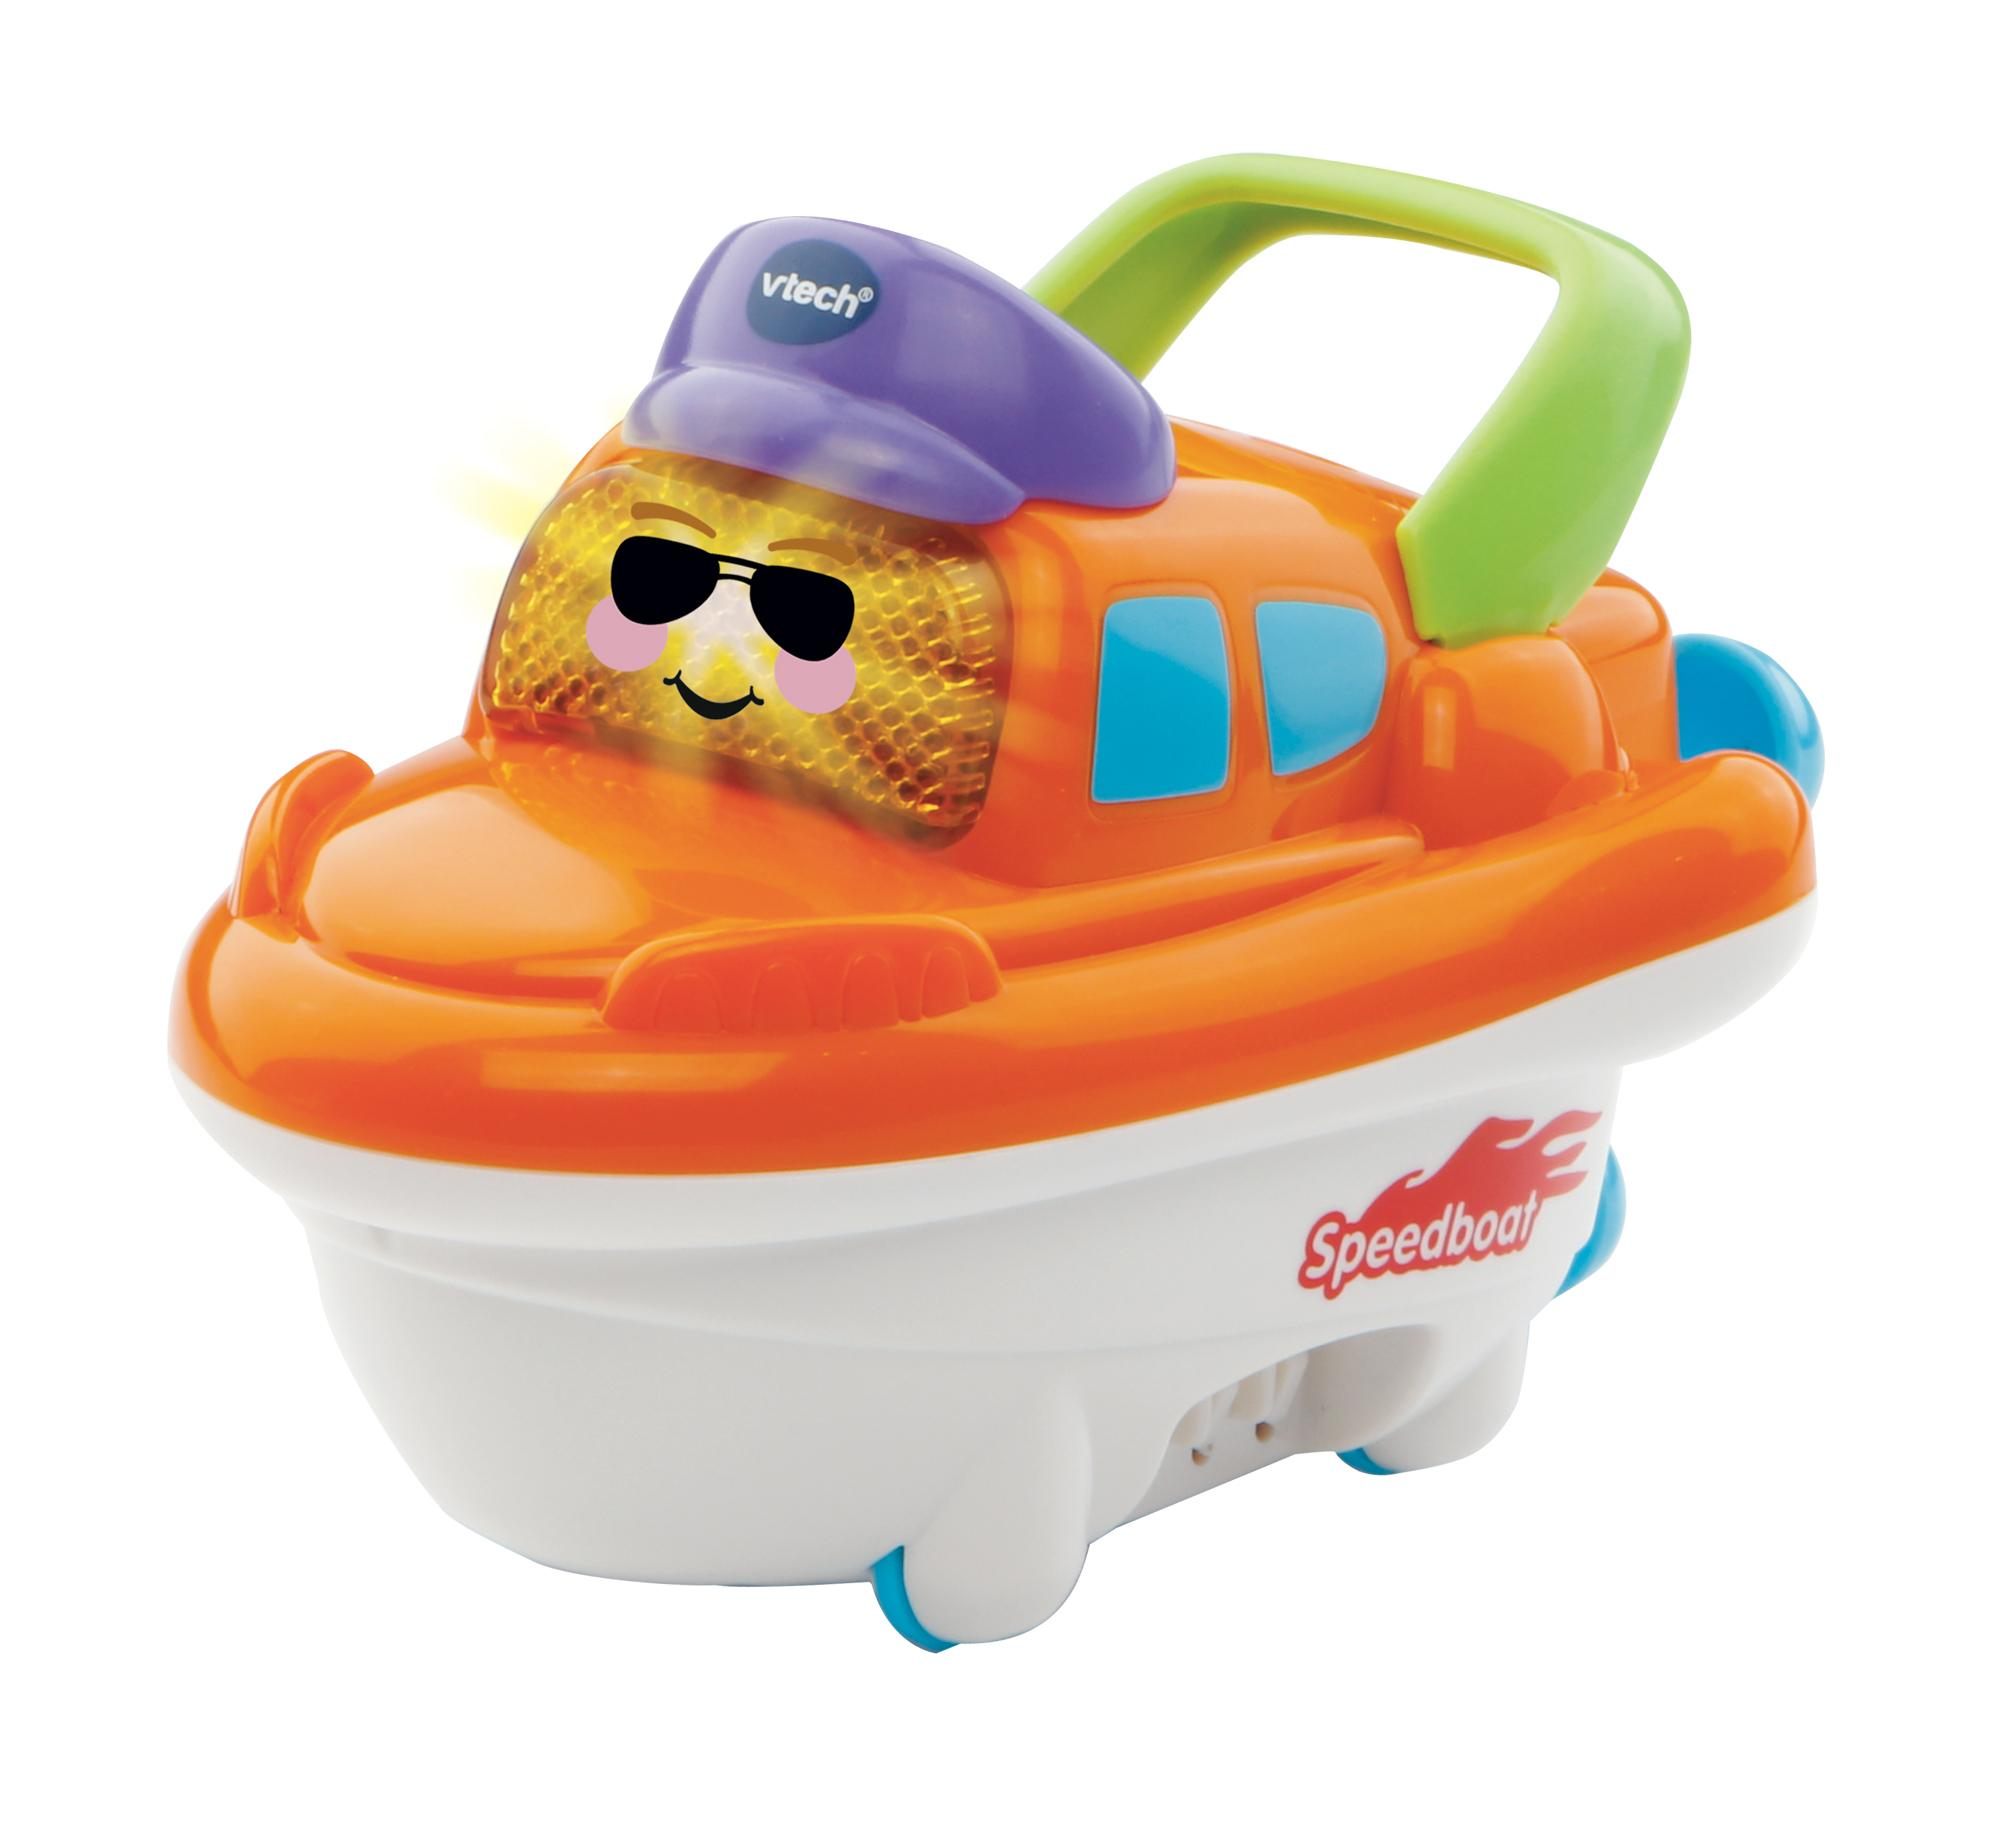 Vtech Baby Toot Toot Splash World Speed Boat Toy Amazon